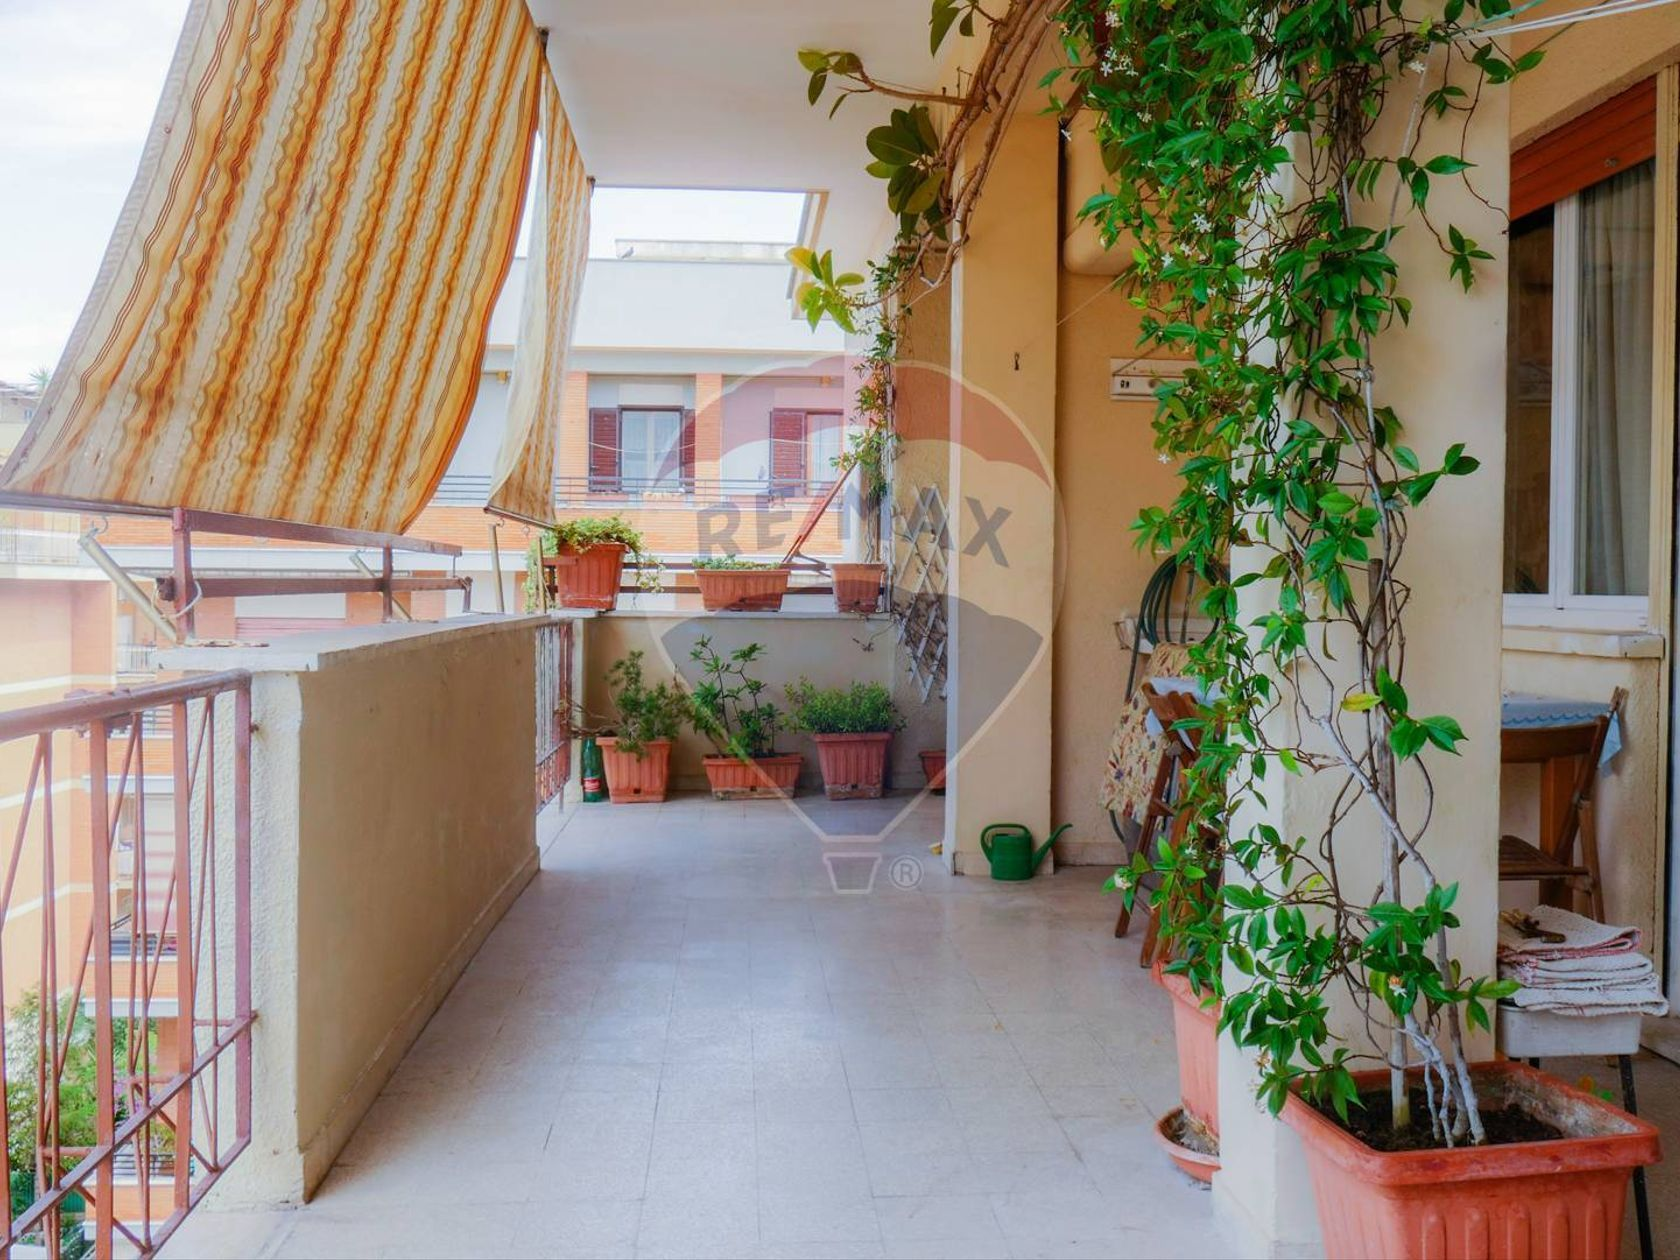 Attico/Mansarda Ostia, Roma, RM Vendita - Foto 5